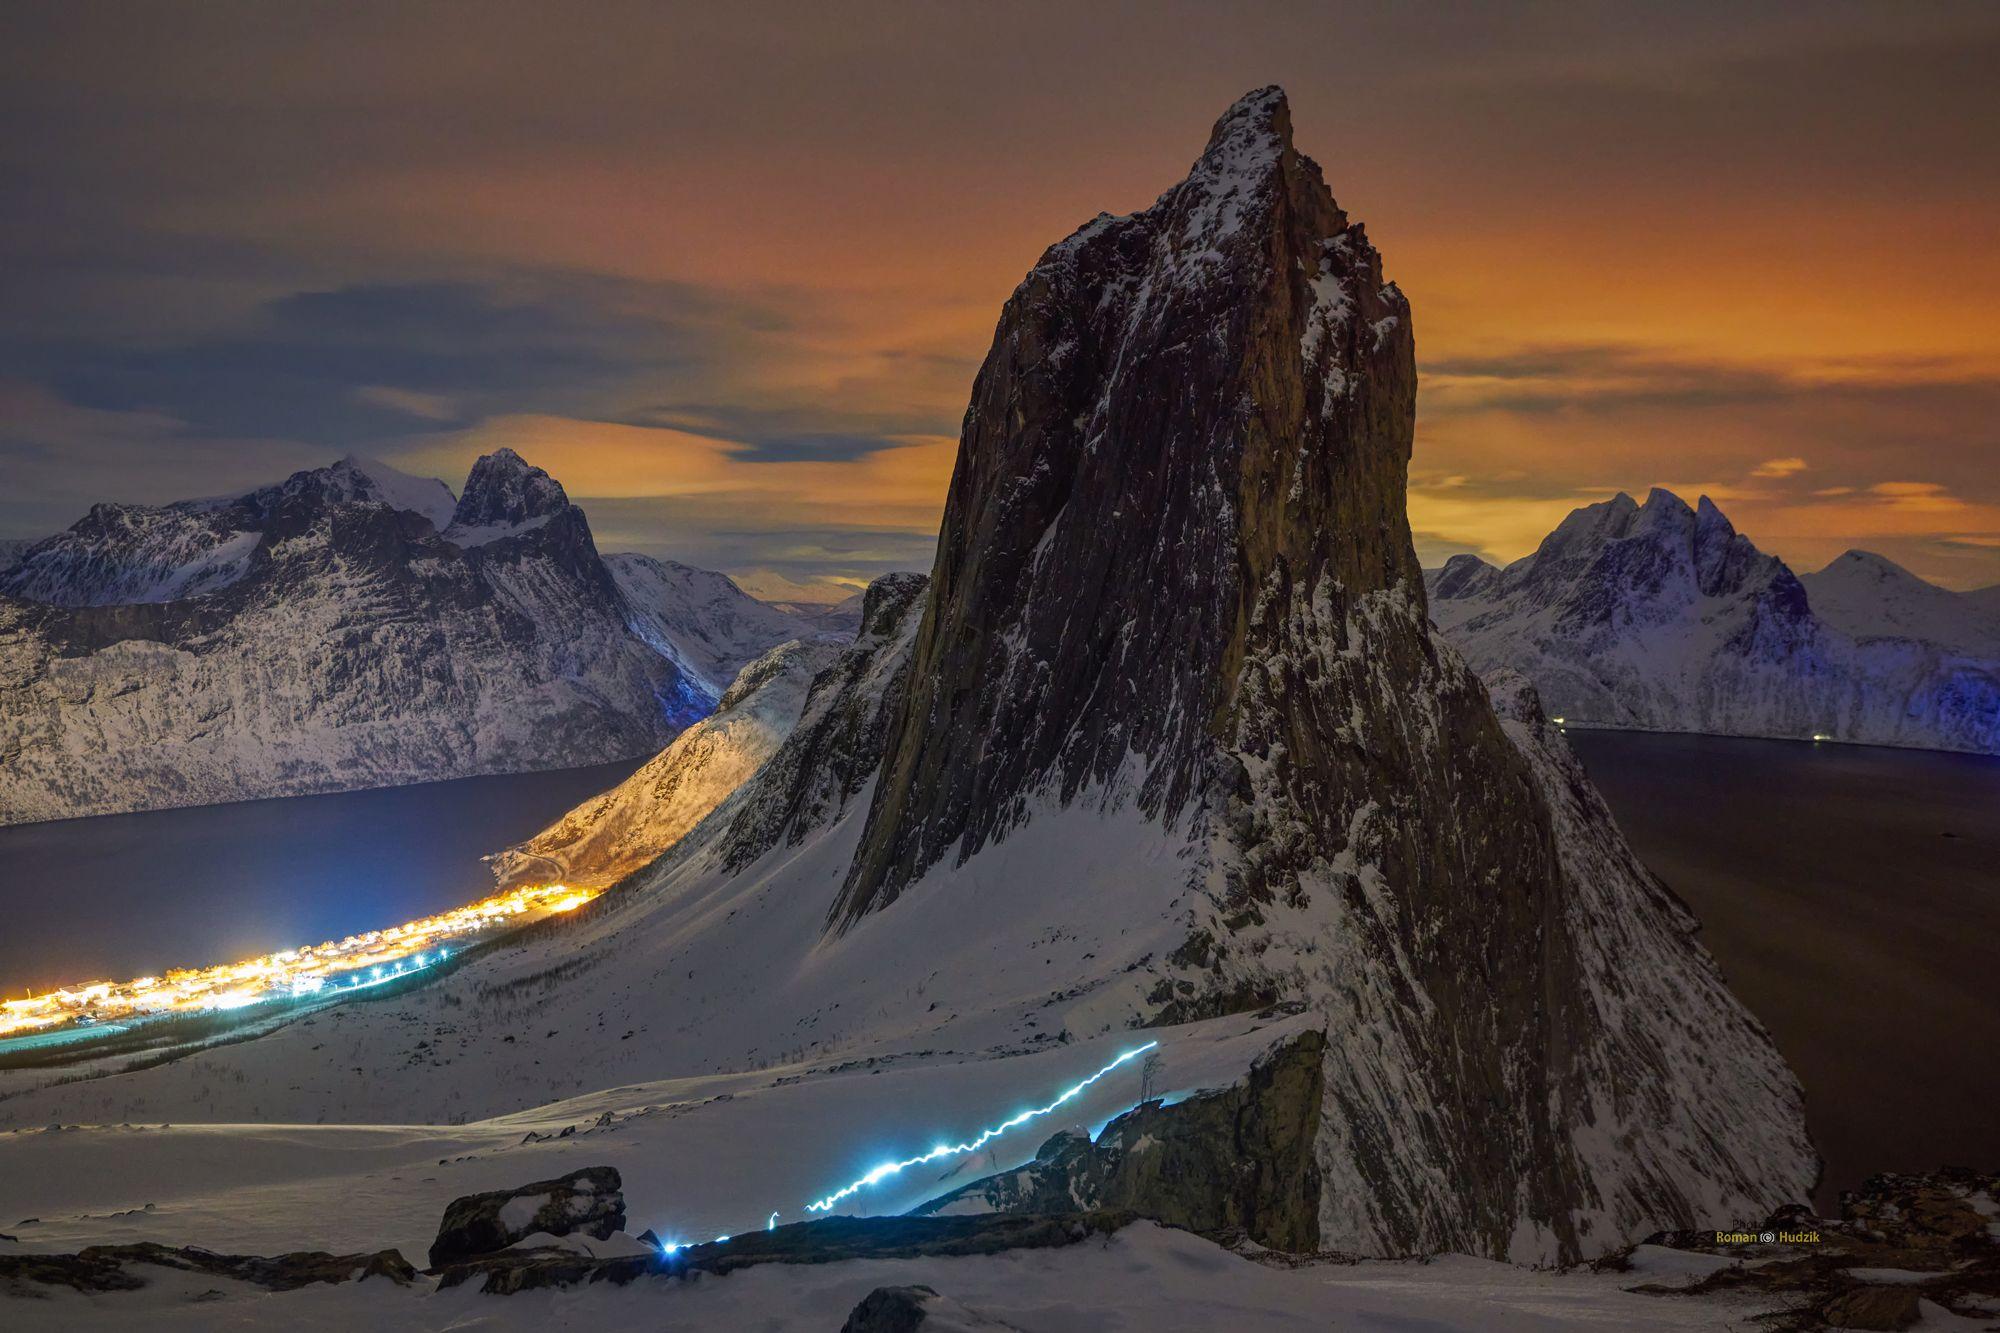 Segla, night, landscape, sky, Lofoten, Senja,, Hudzik Roman